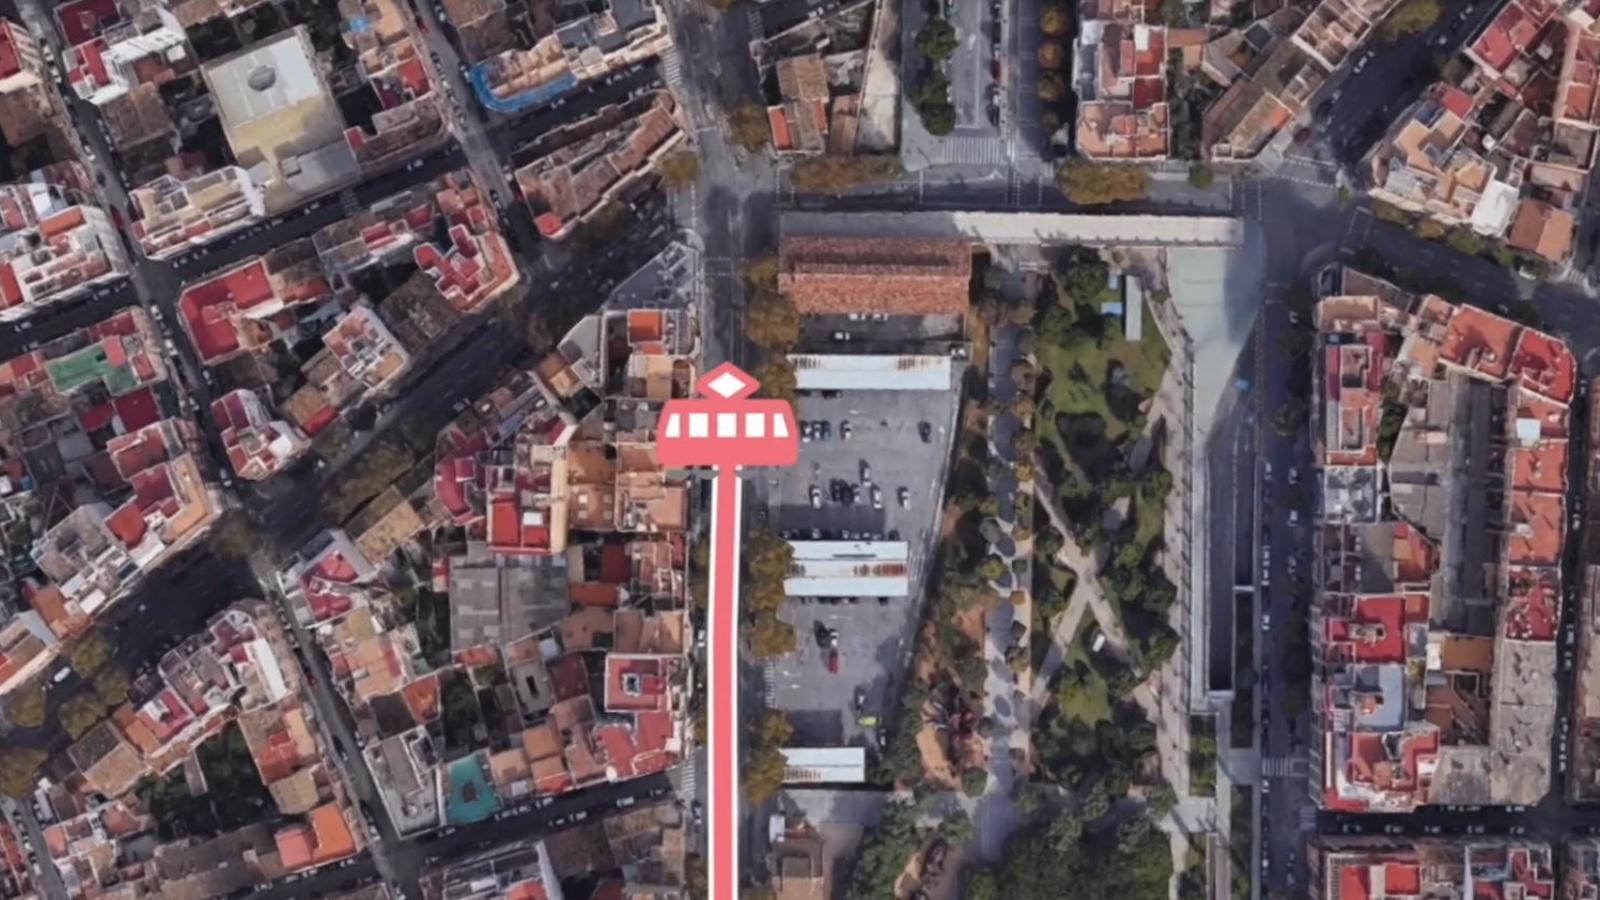 Tramvia plaça d'Espanya a Son Espases